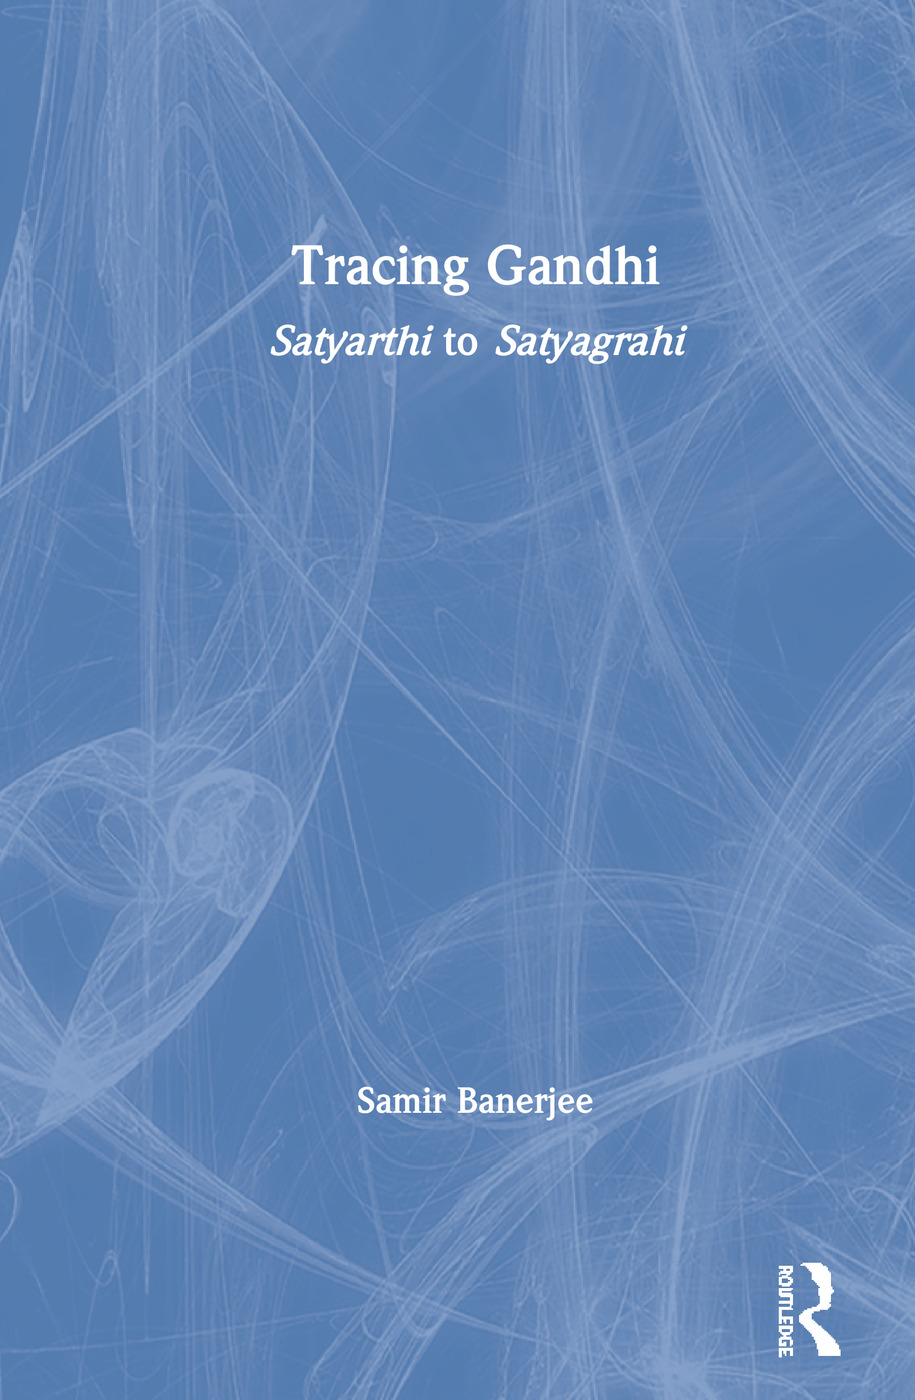 Tracing Gandhi: Satyarthi to Satyagrahi book cover